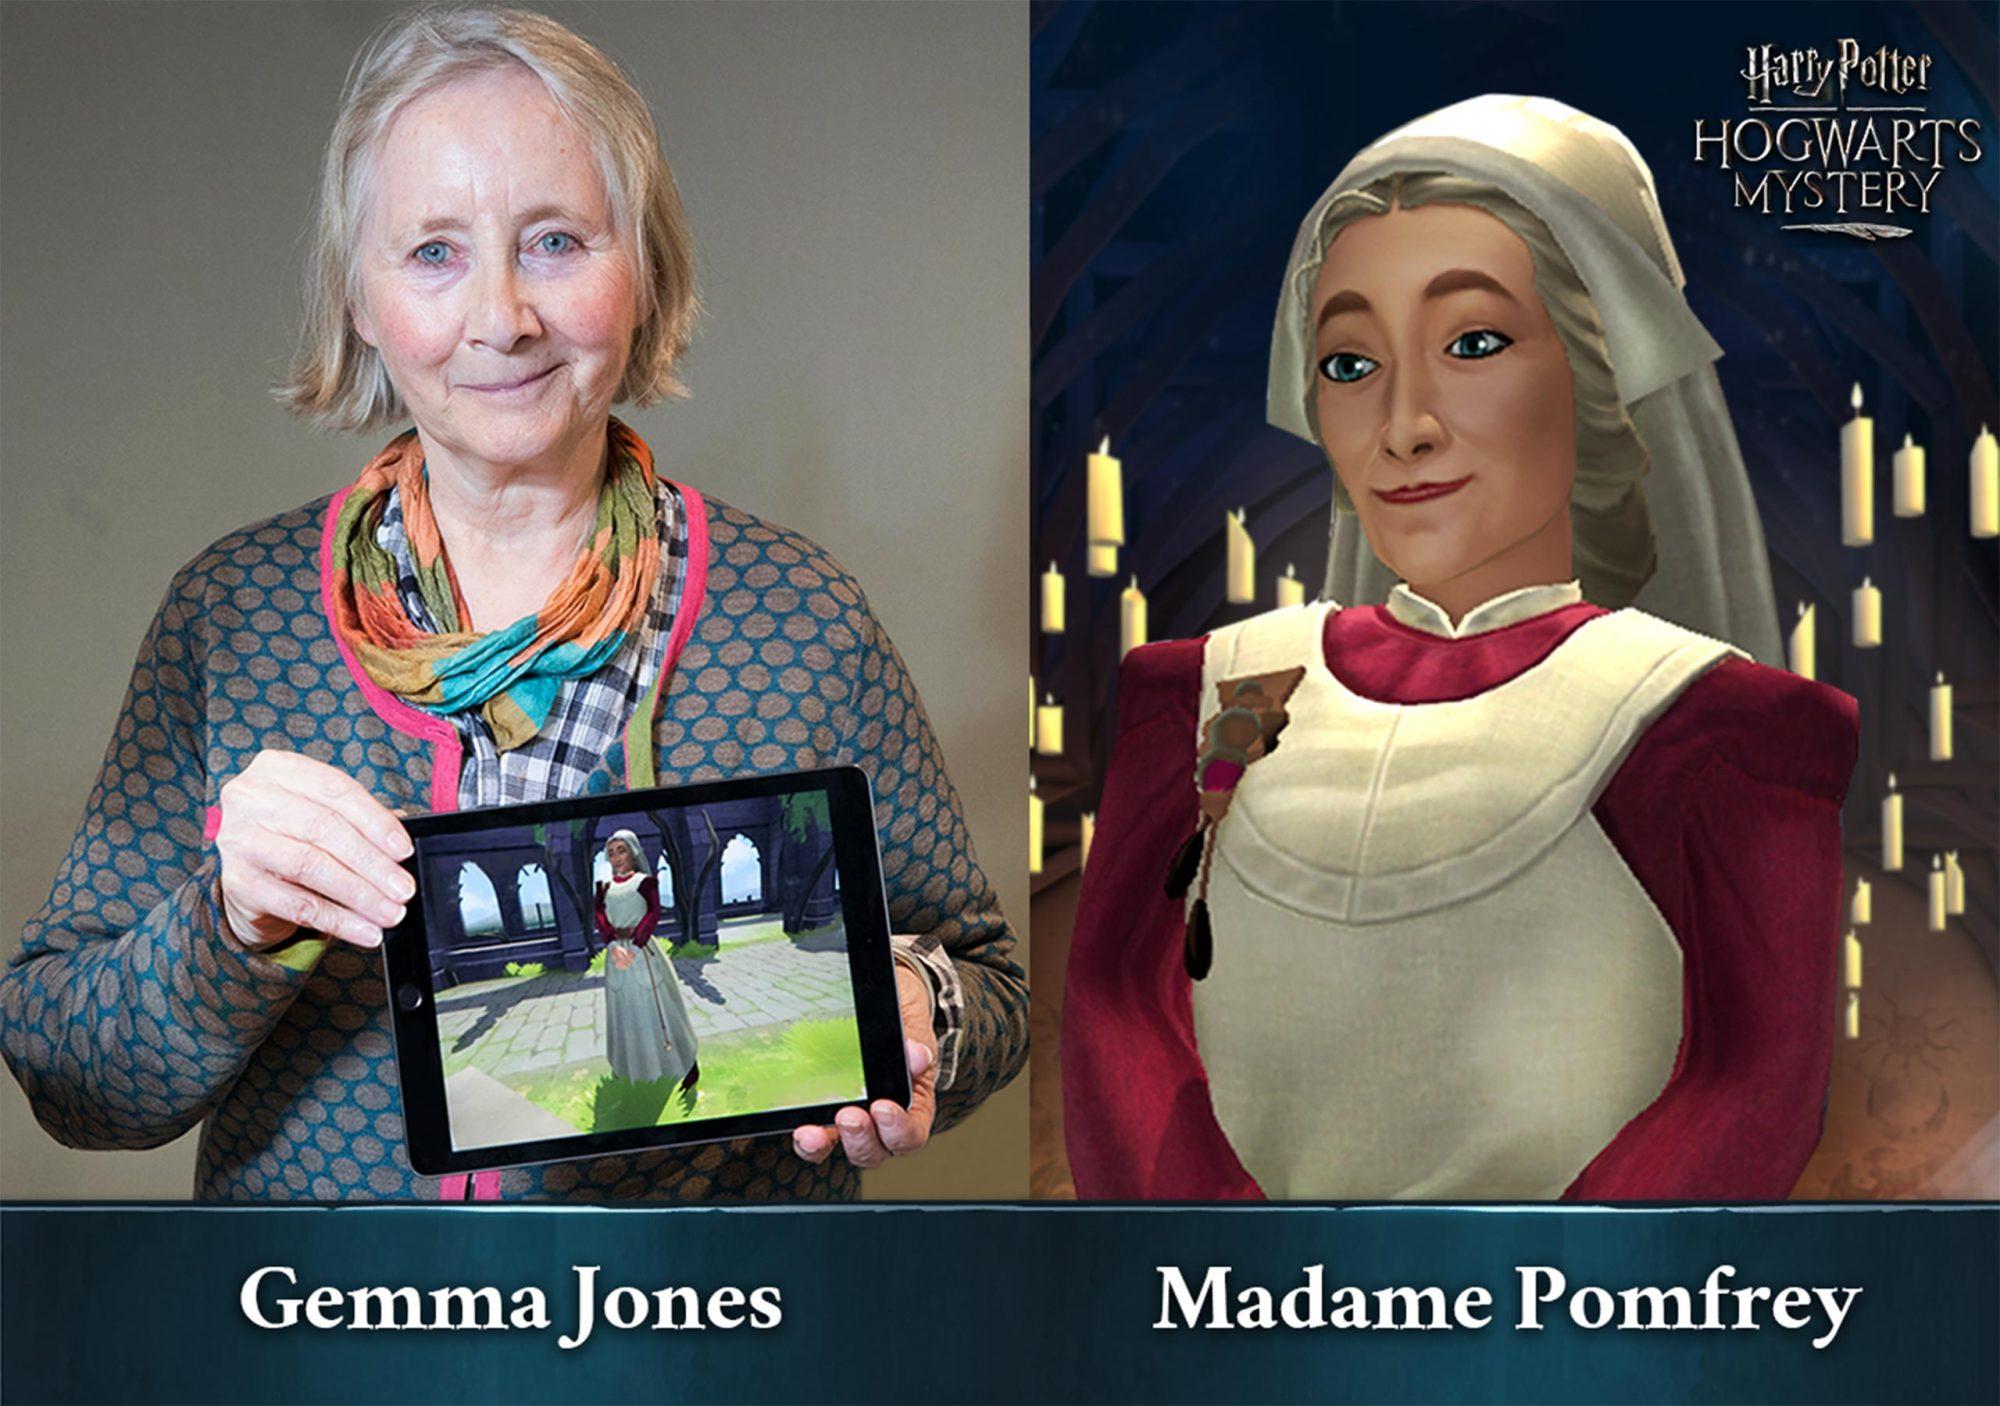 HP_Press_GemmaJones_MadamPomfrey_02